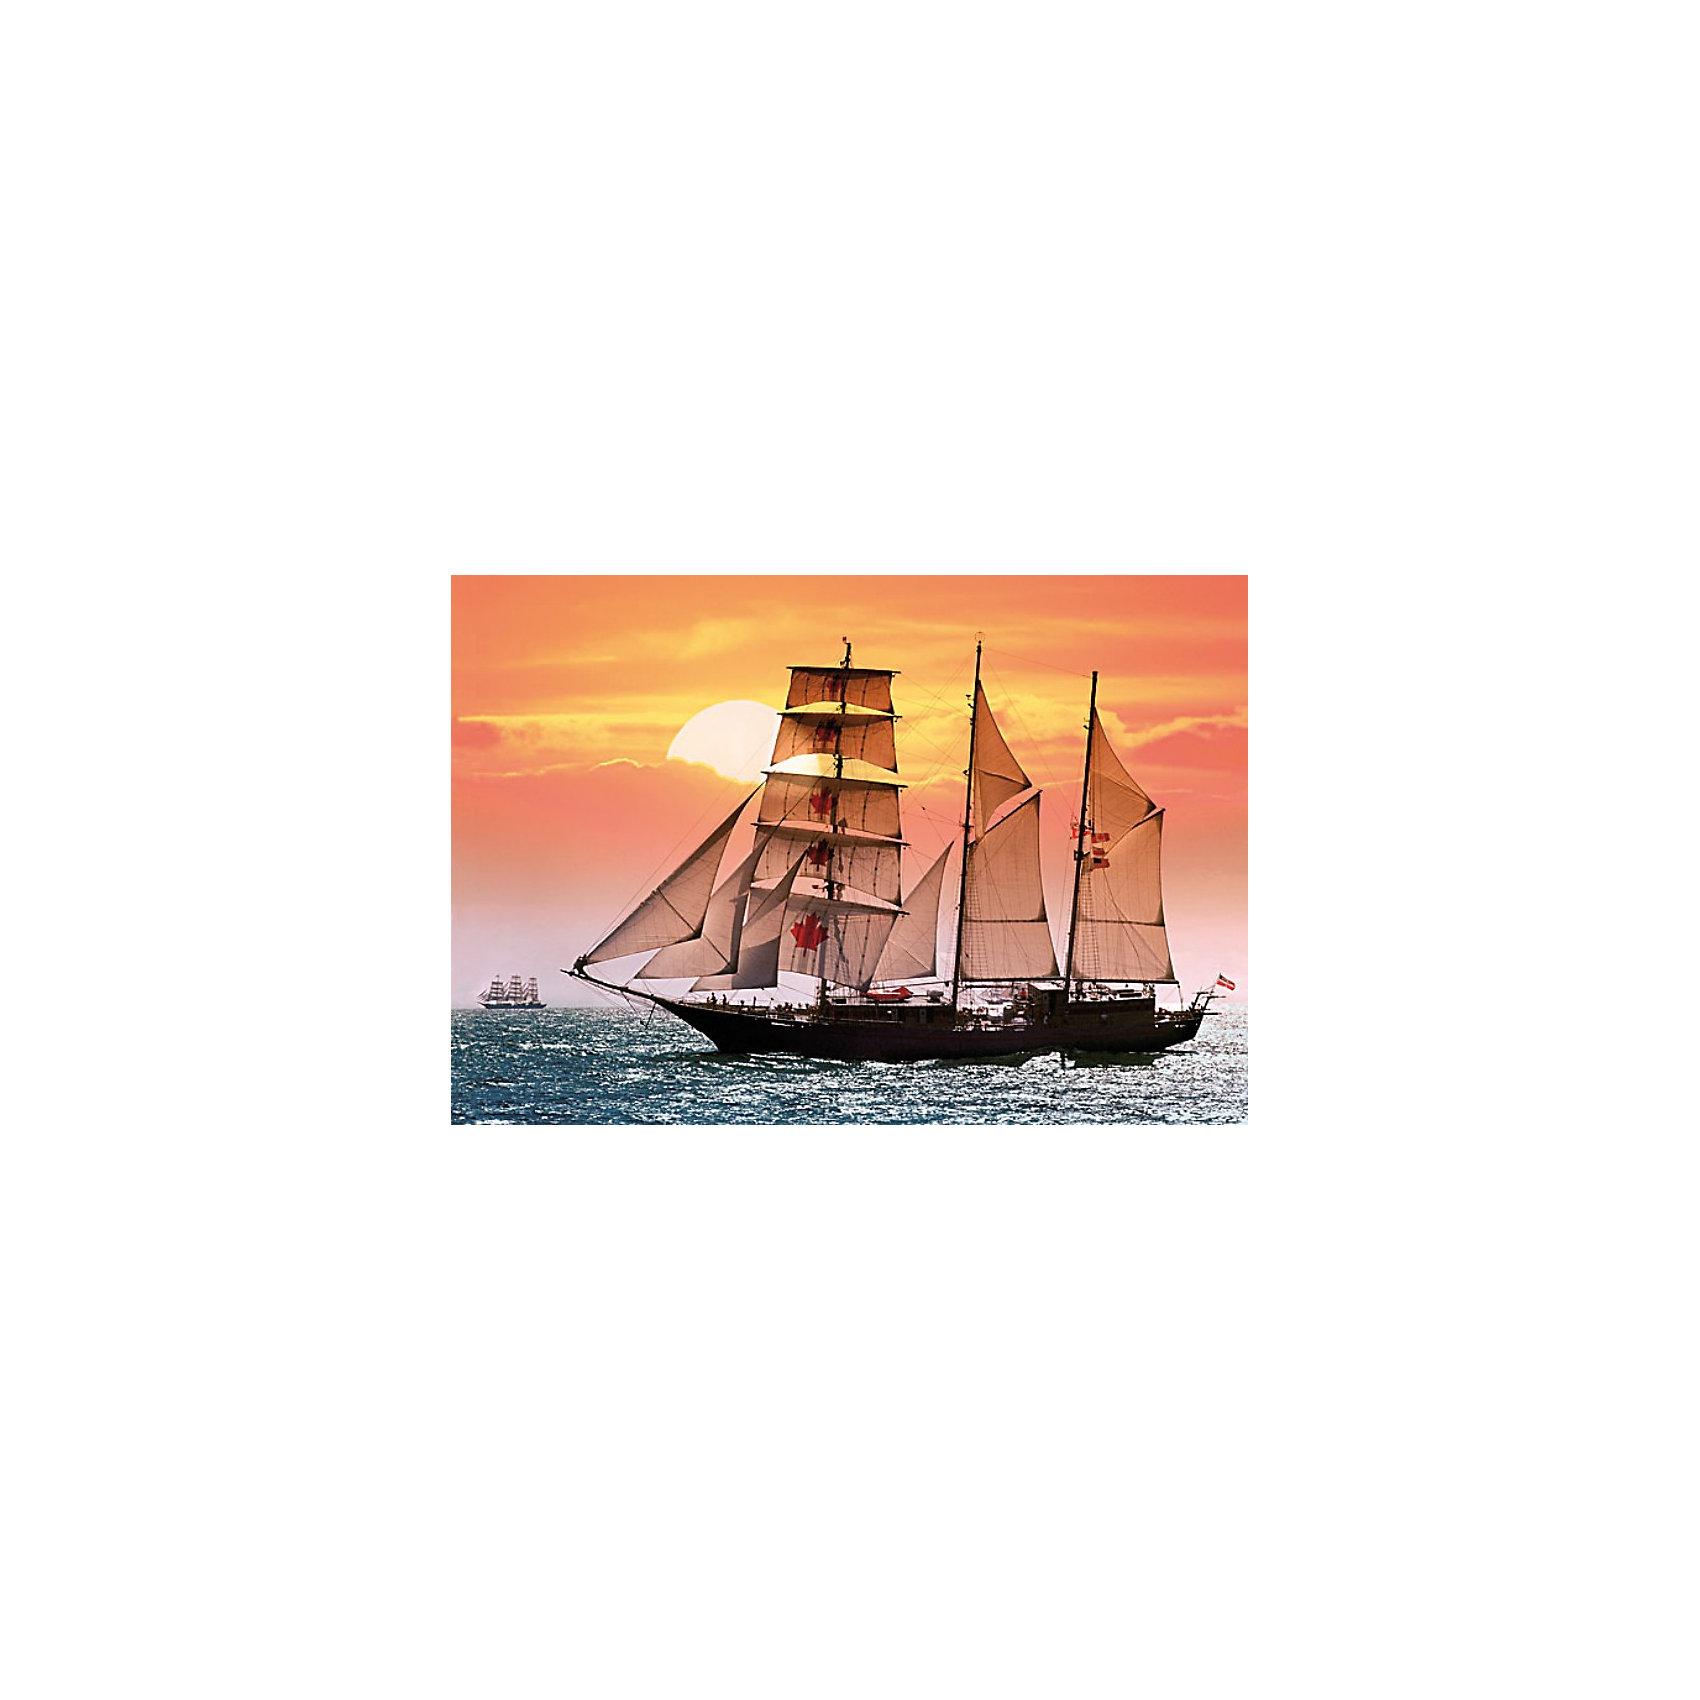 Castorland Пазлы Парусник, 1000 деталей, Castorland пазлы magic pazle объемный 3d пазл эйфелева башня 78x38x35 см